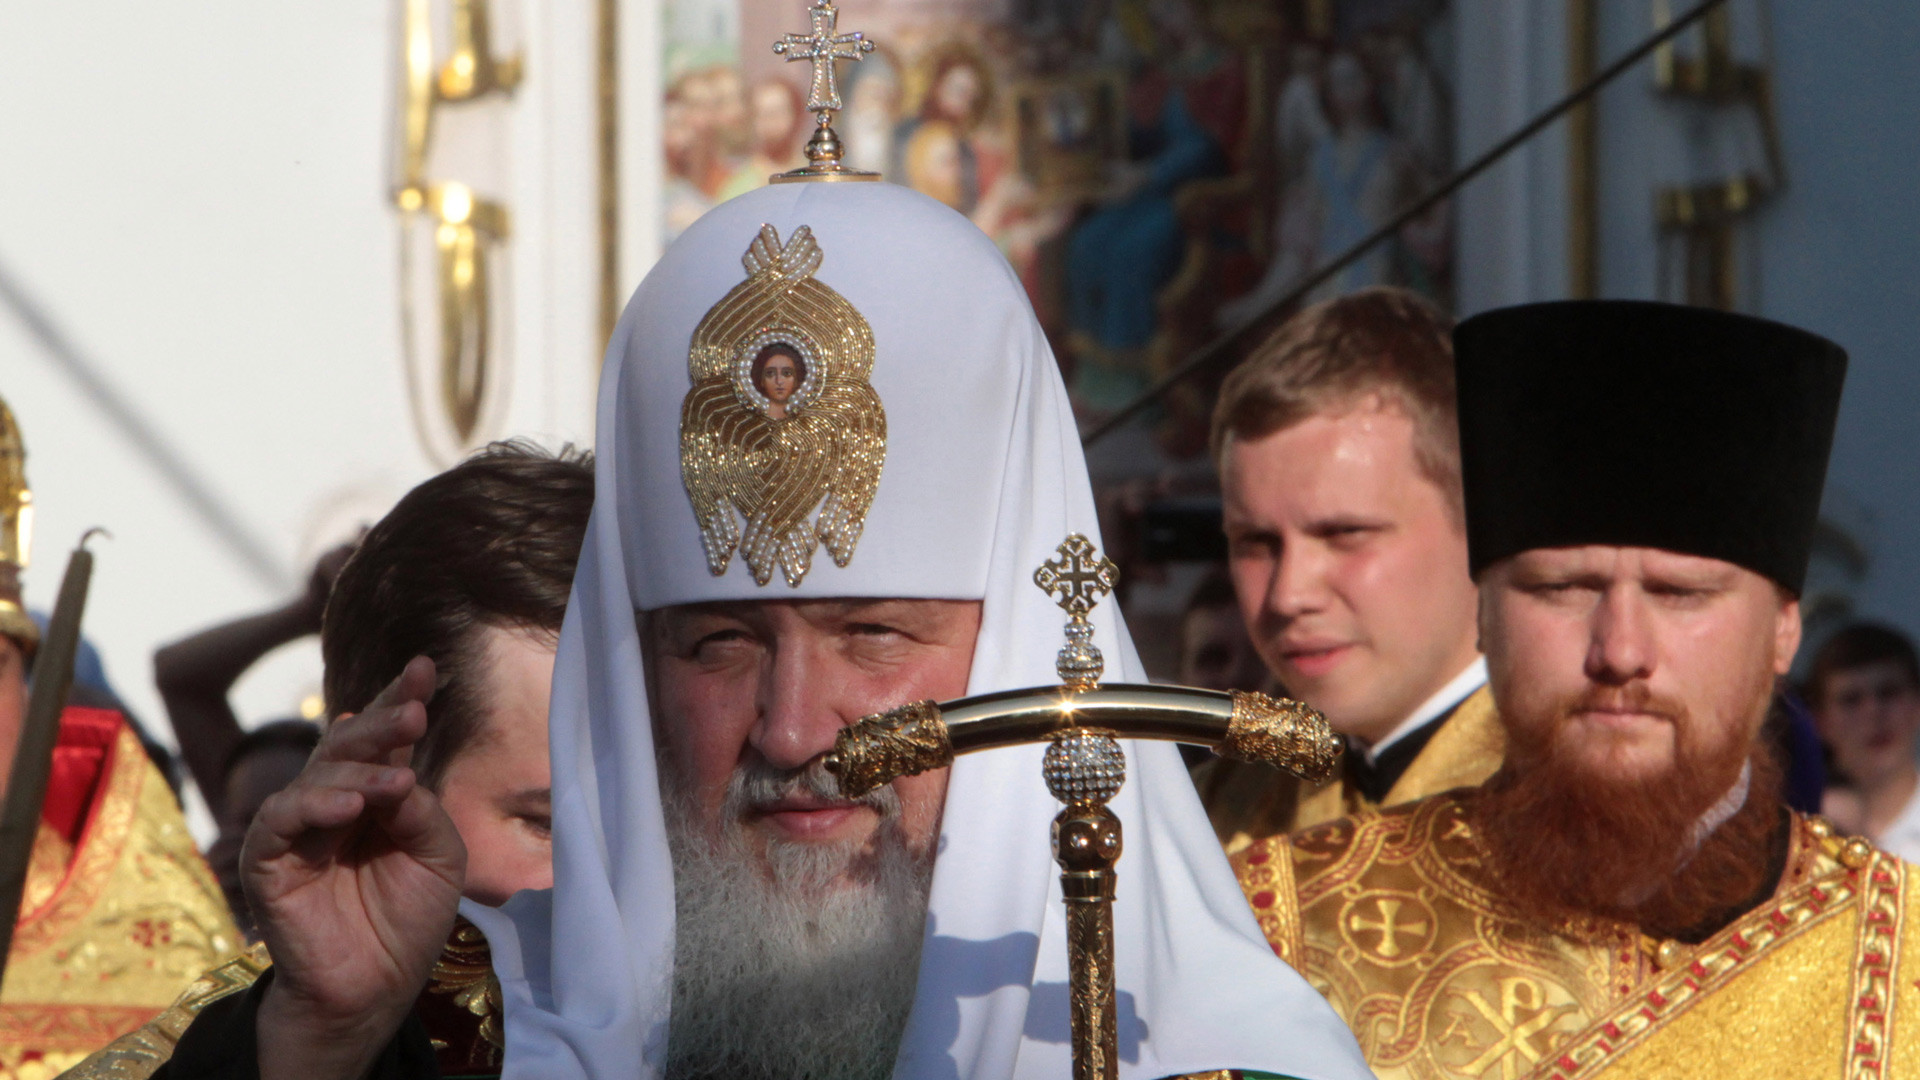 Фото: ©РИА Новости / Григорий Василенко